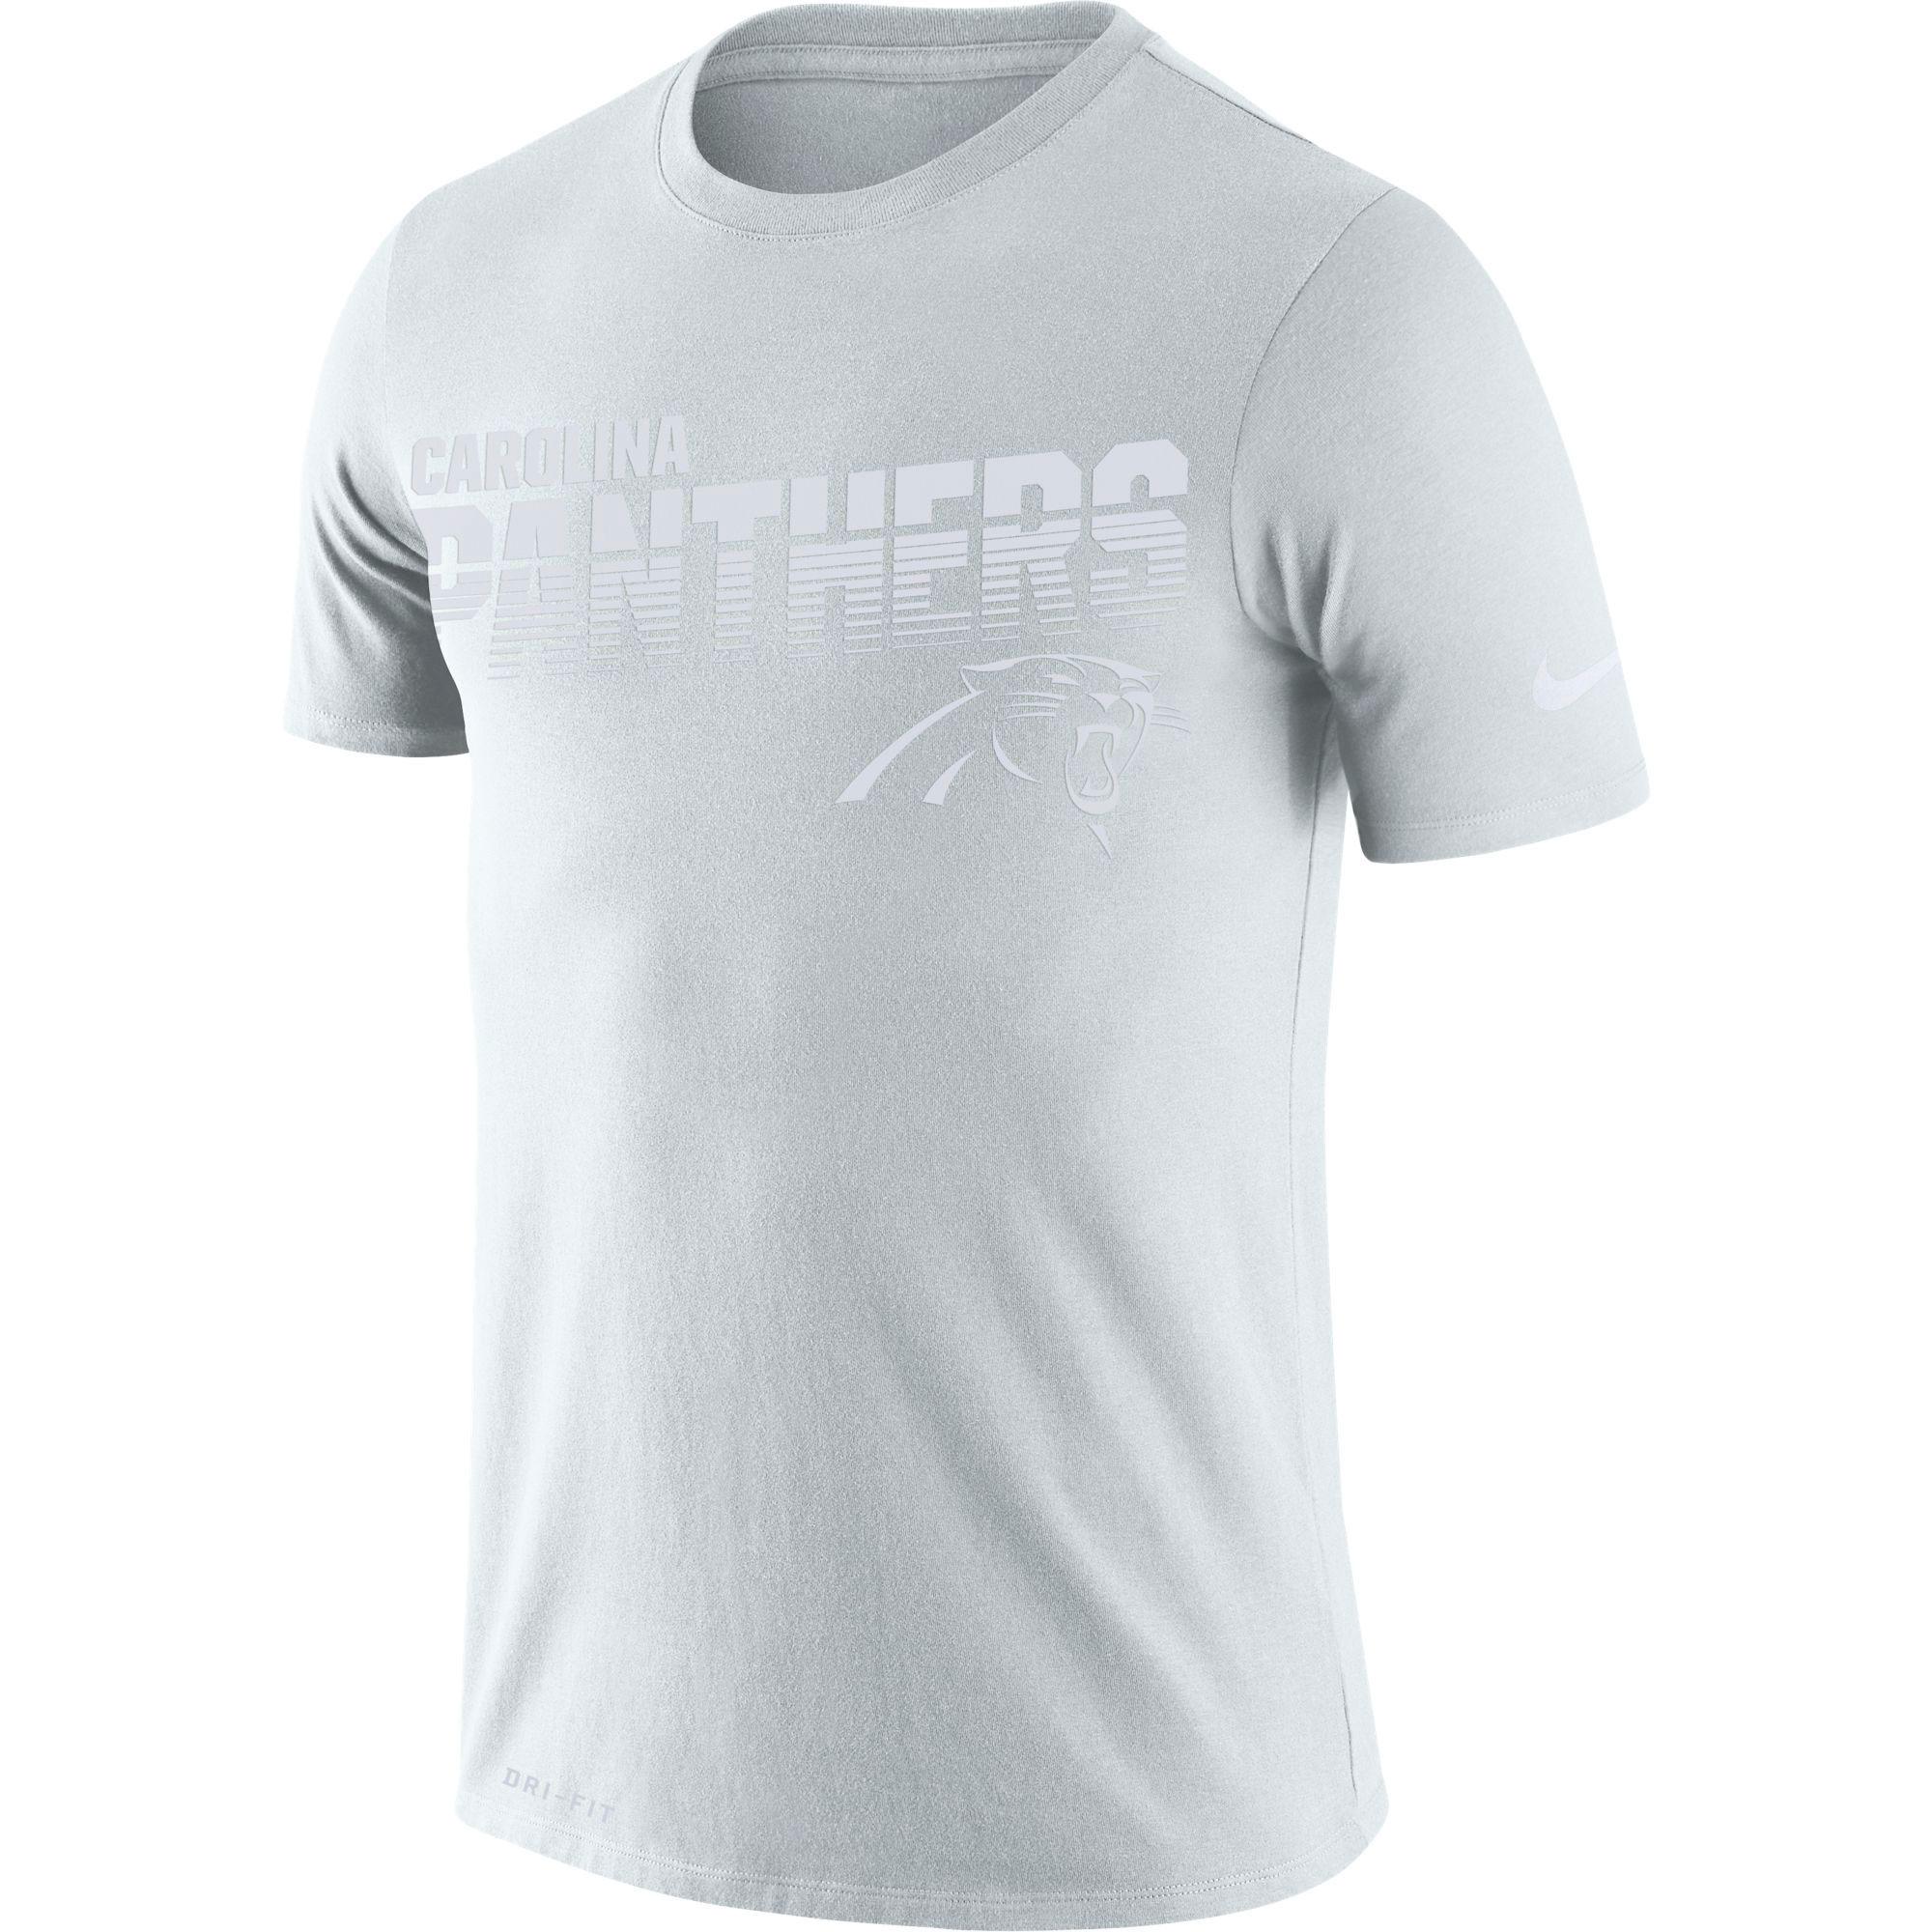 Carolina Panthers Nike NFL 100 Years Sideline T-Shirt - Mens